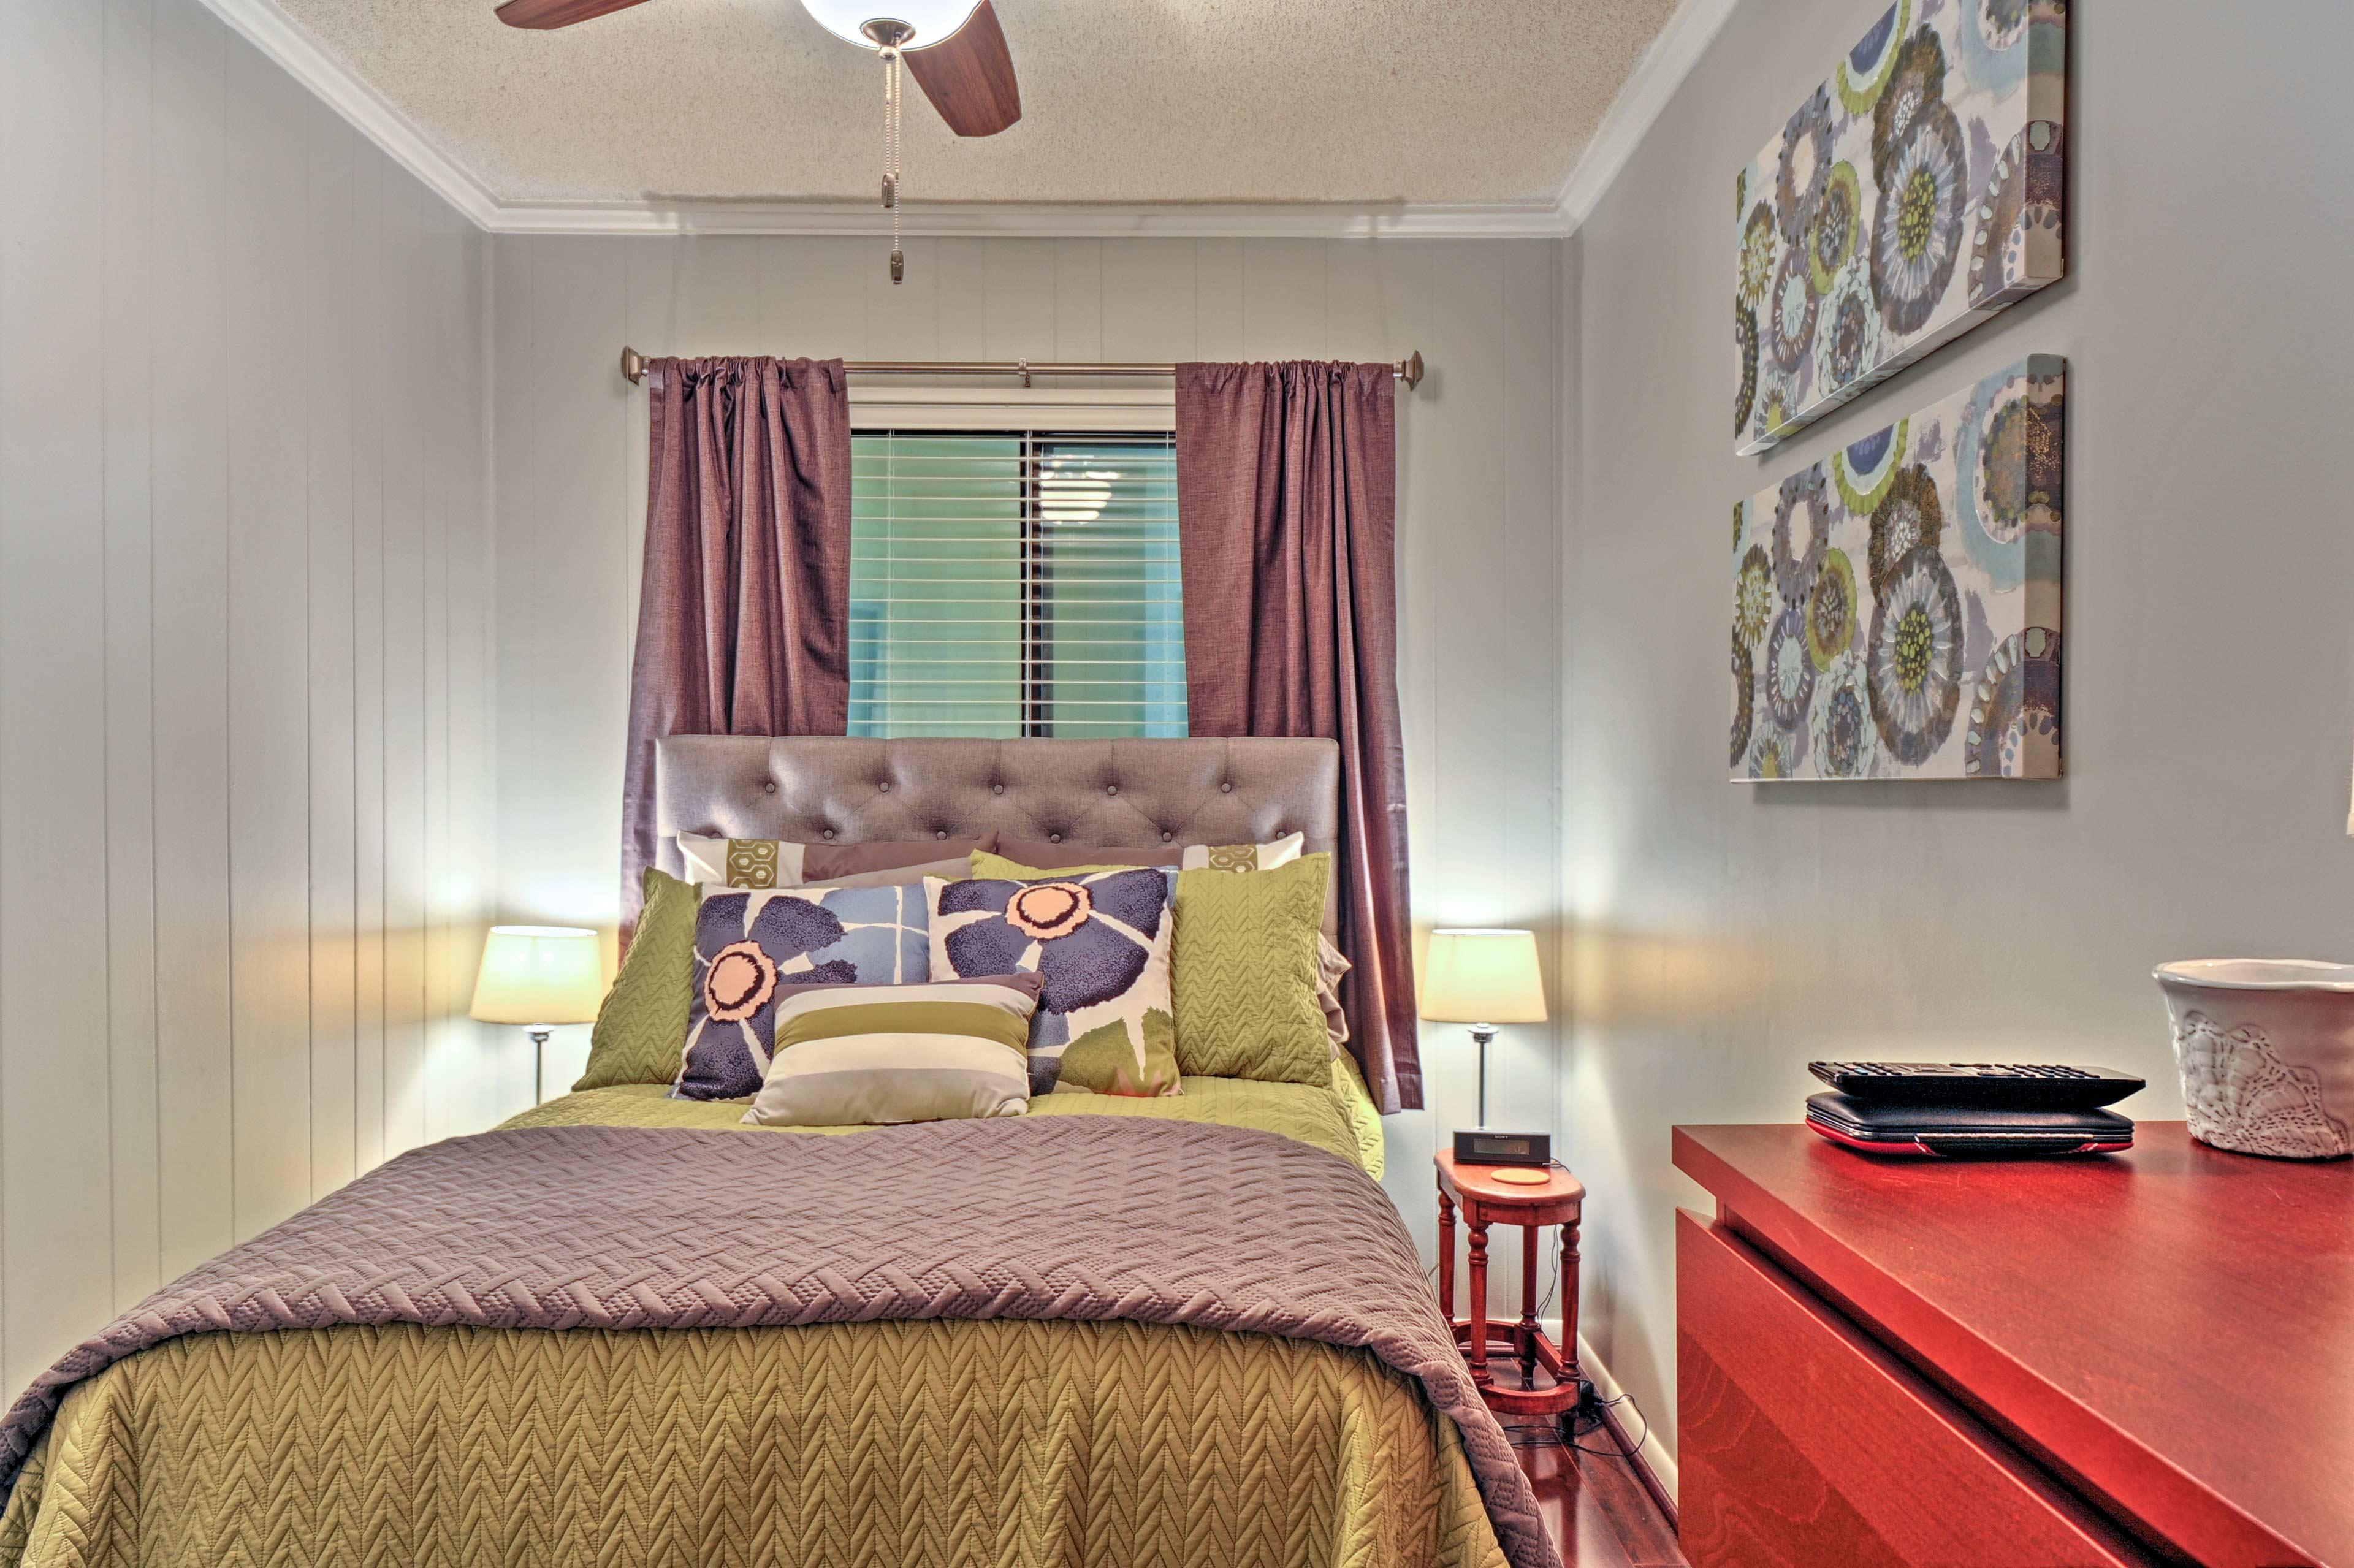 Bedroom | Full Bed | Linens Provided